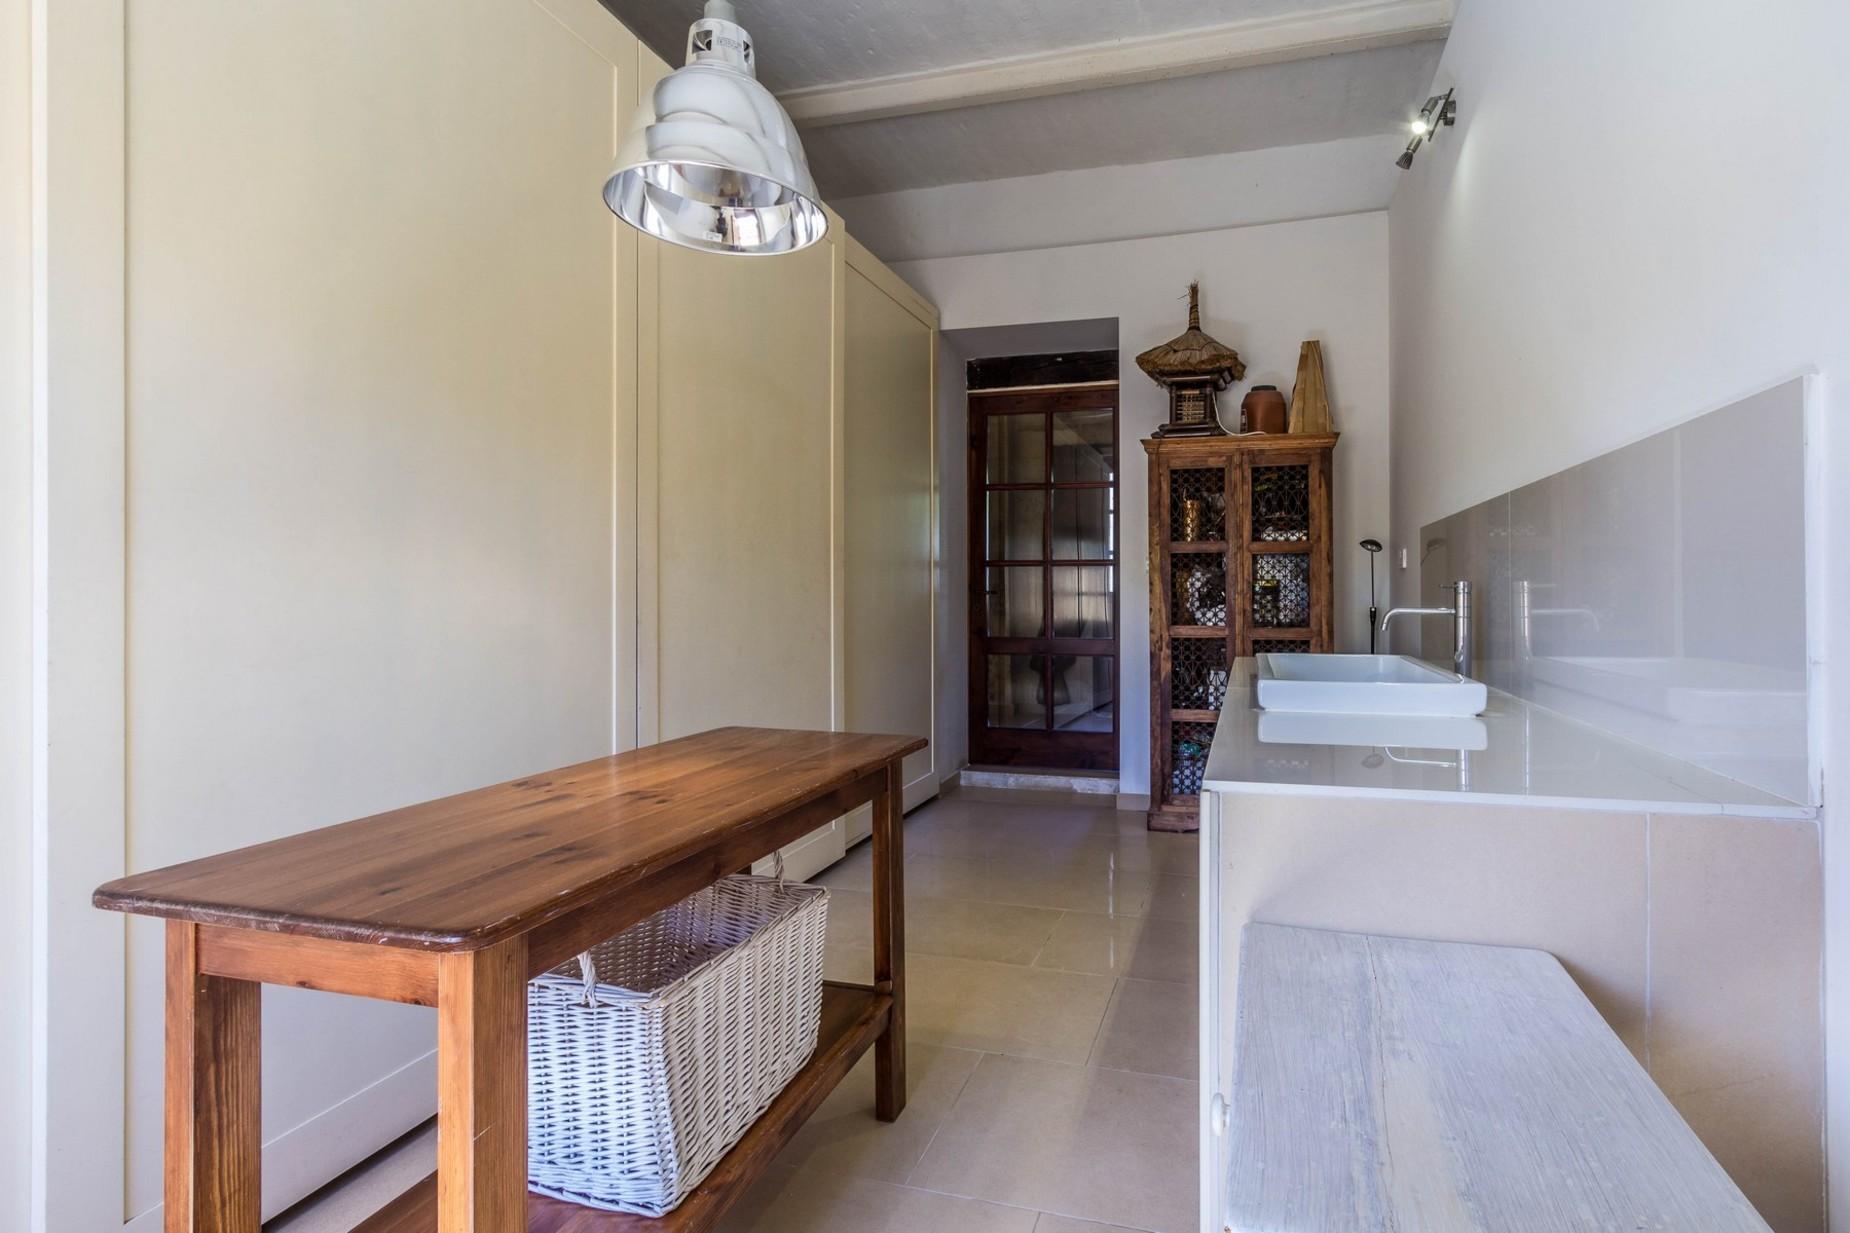 3 bed Farmhouse For Sale in Marsascala, Marsascala - thumb 17